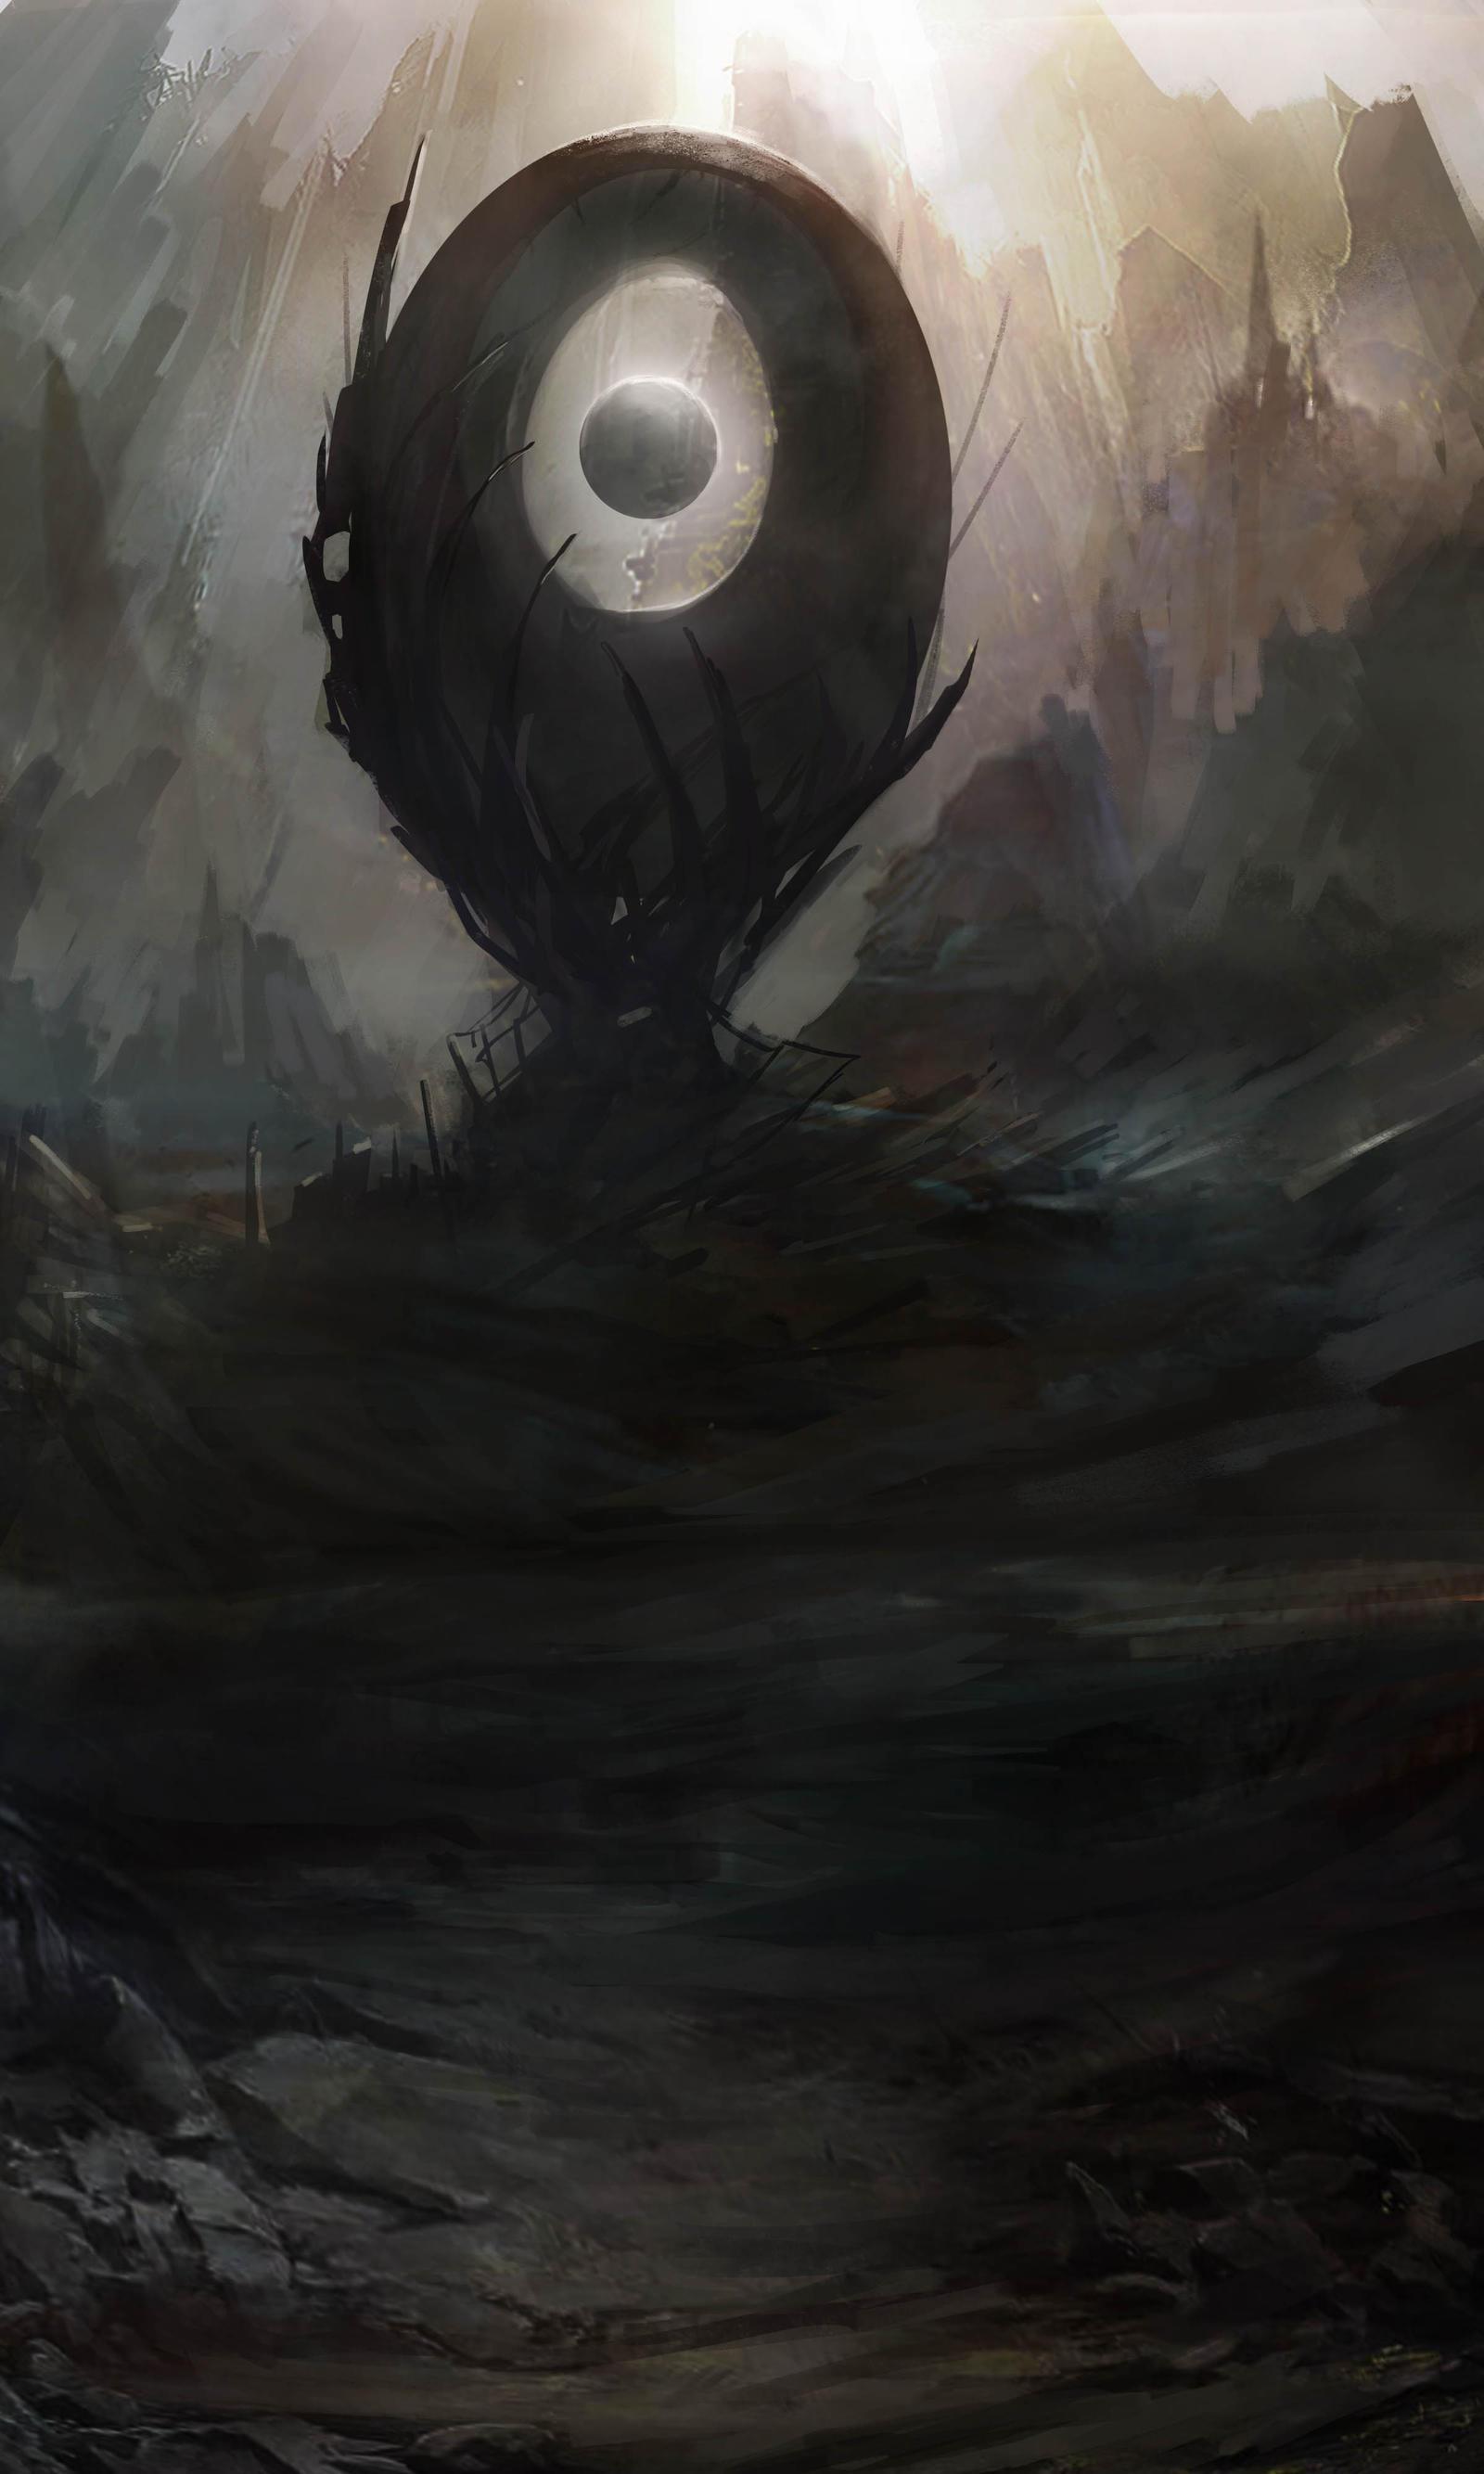 Time stone by Darkcloud013